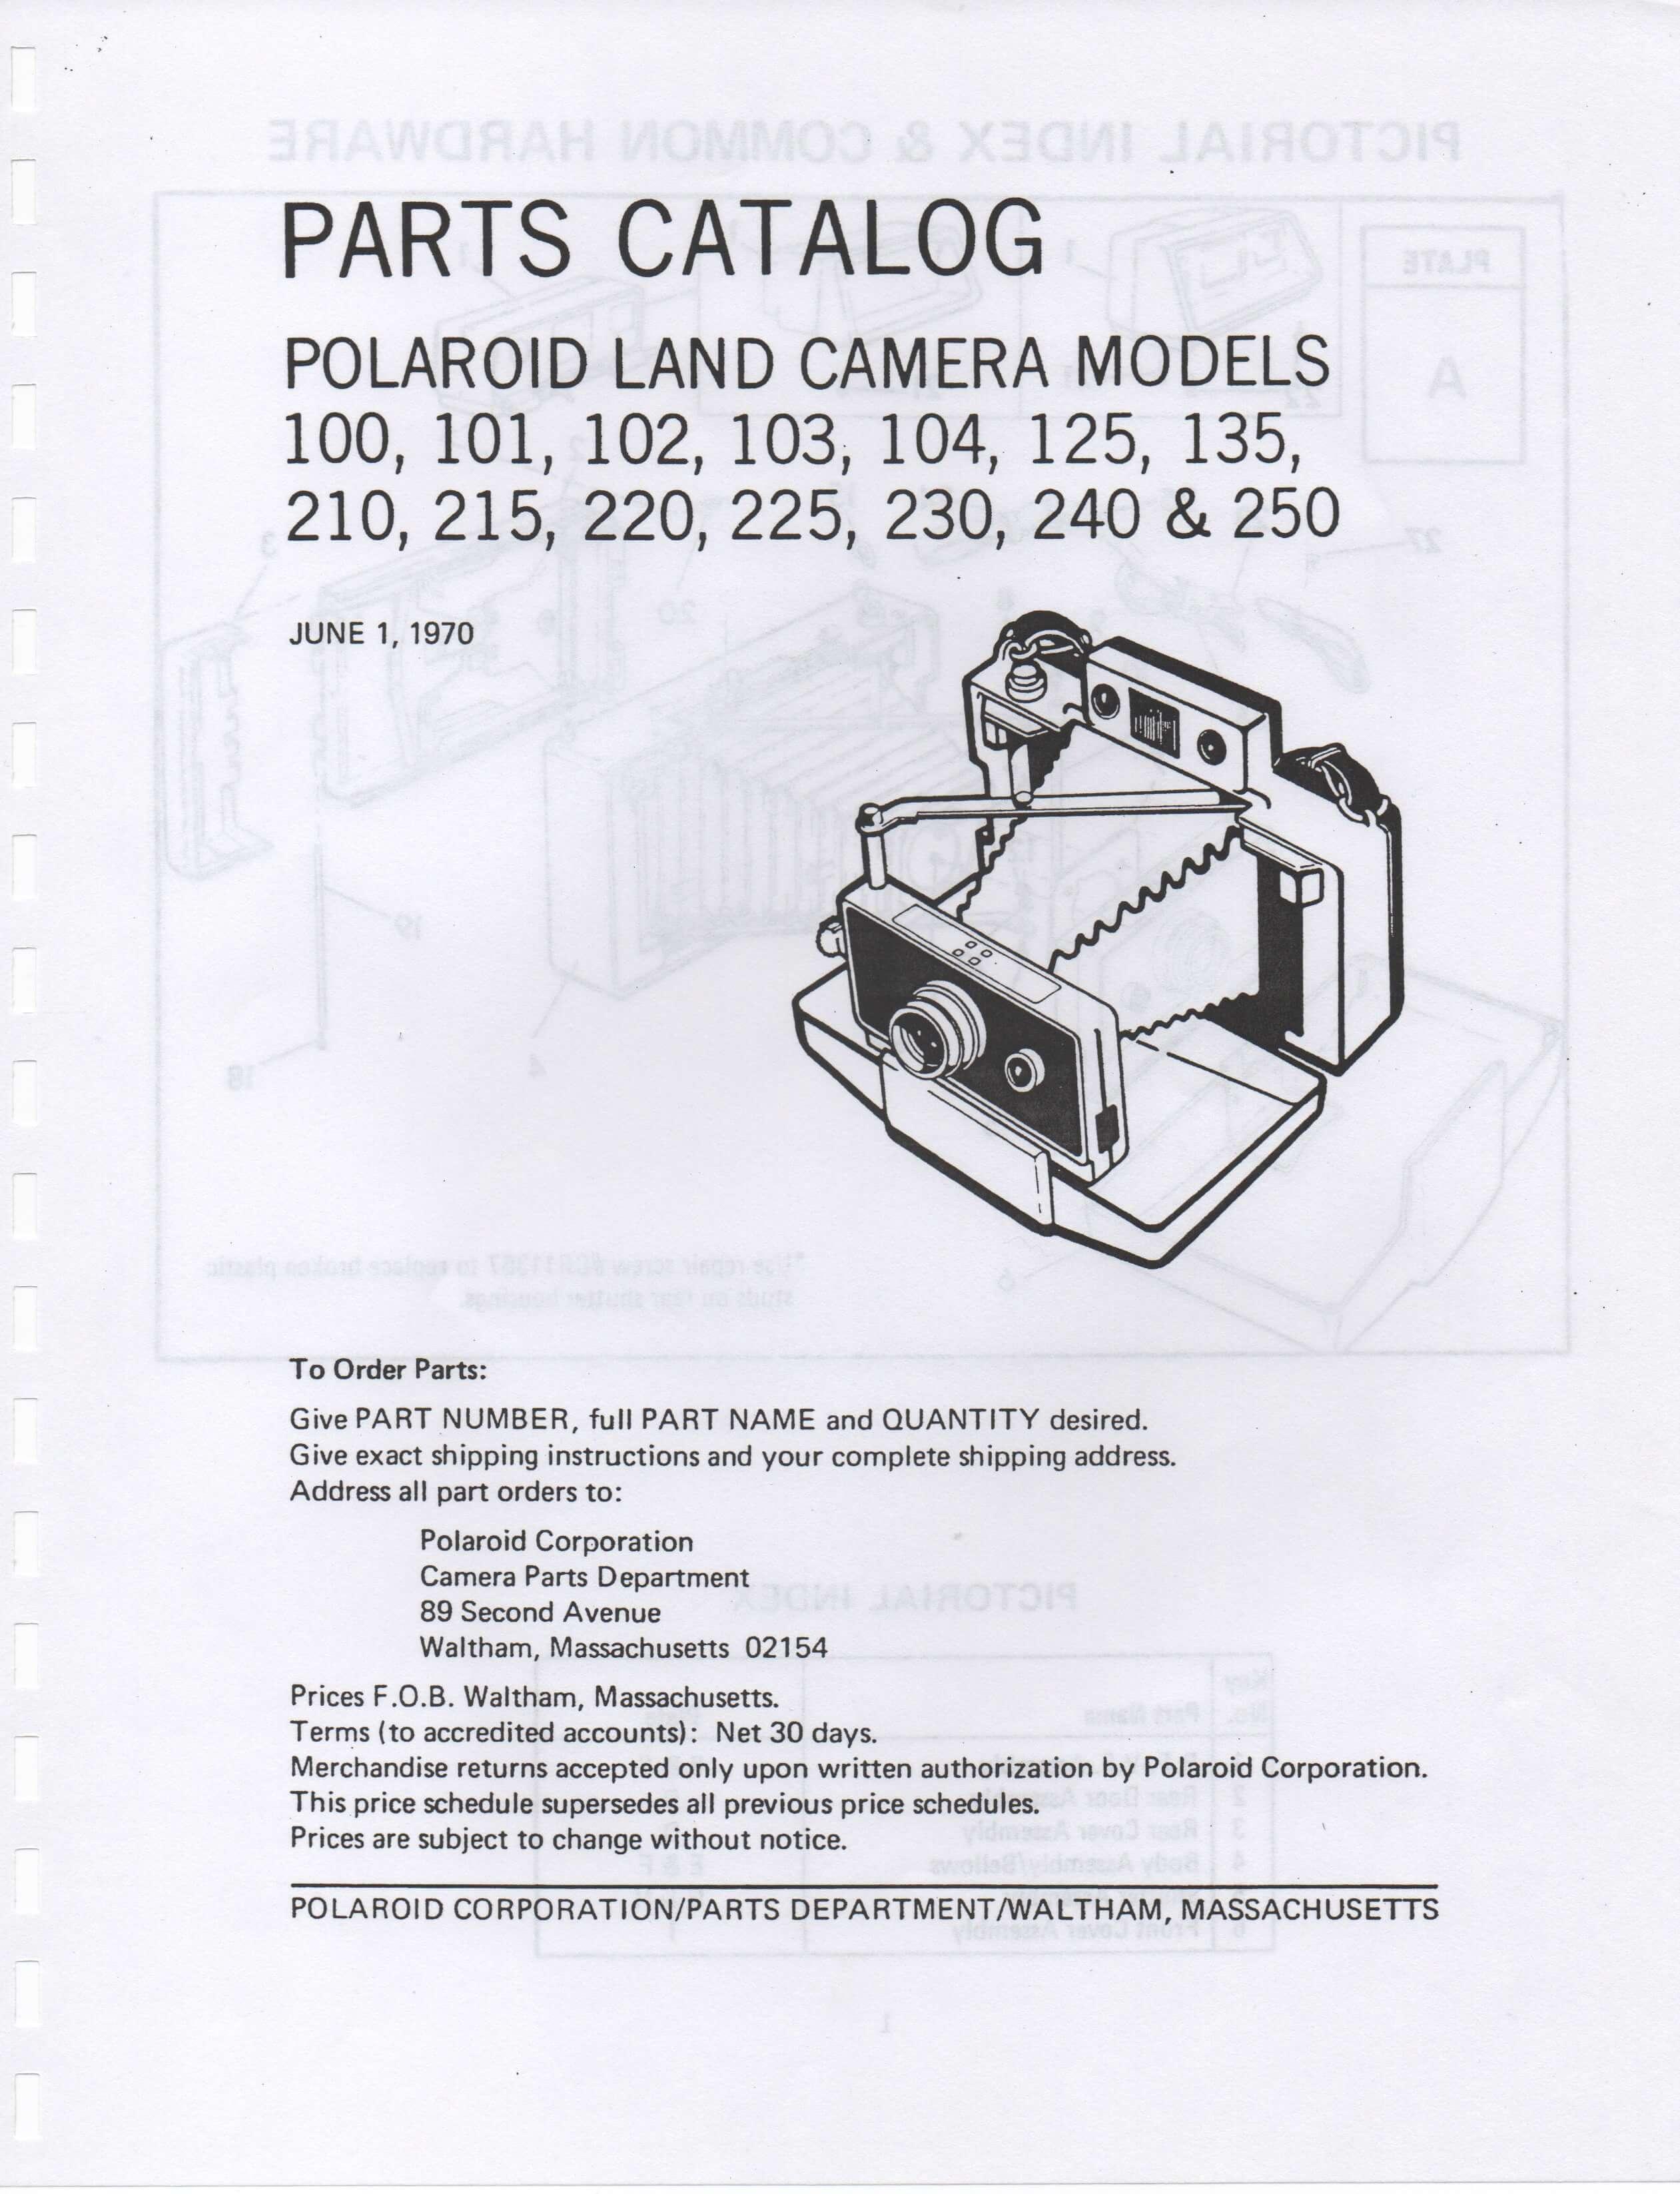 240 Wire Diagram Polaroid Camera - DATA Wiring Diagrams •